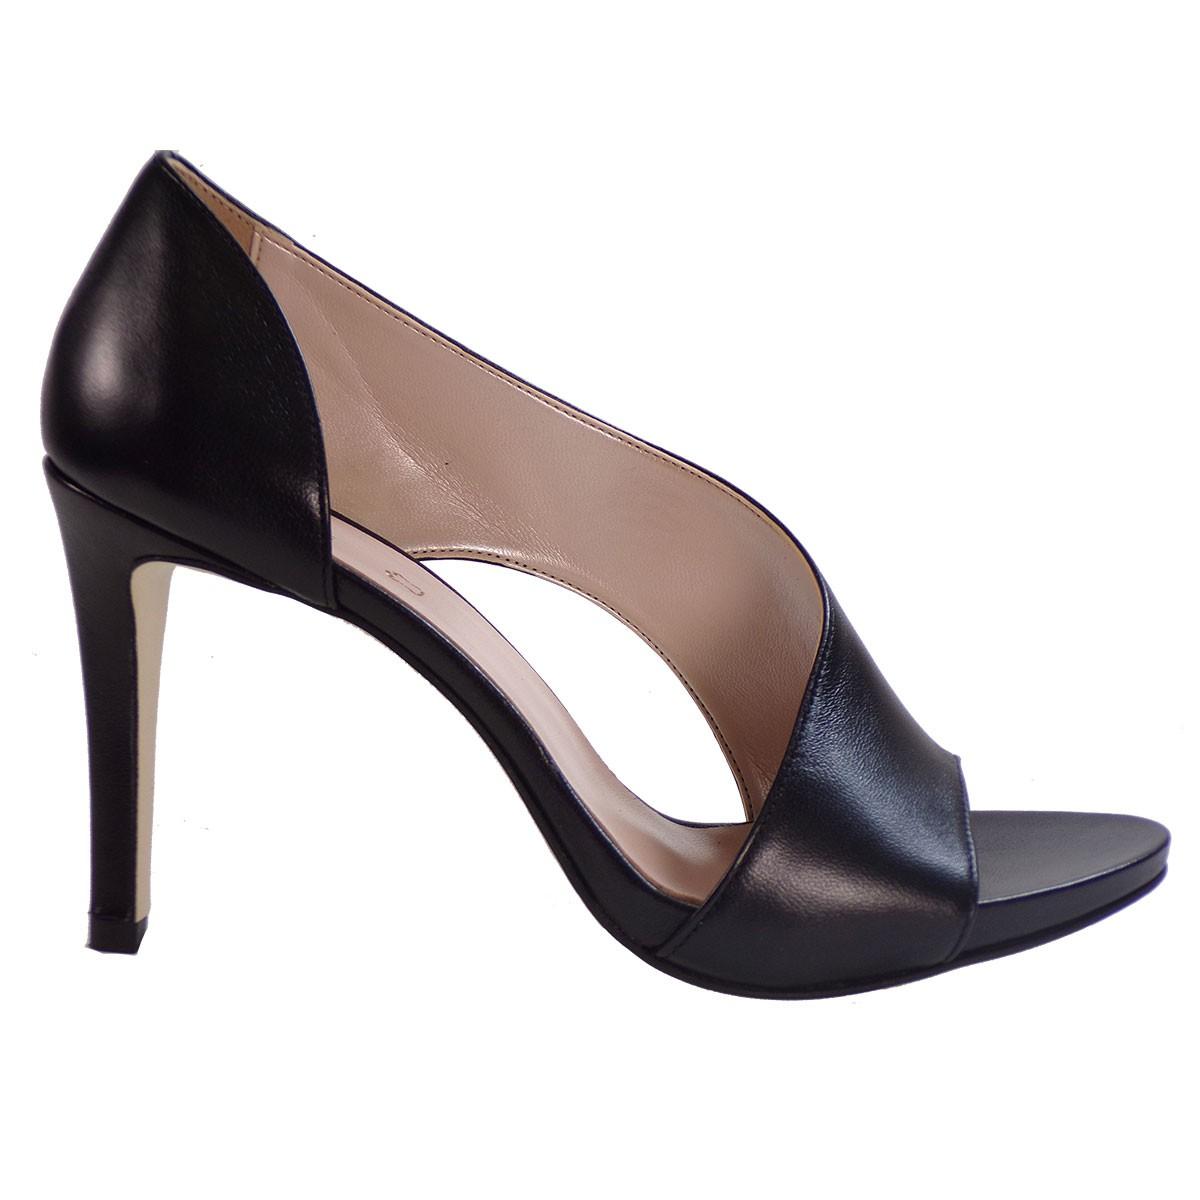 fe833f948b Fardoulis Shoes Γυναικεία Παπούτσια Γόβες 8187 Μαύρο Δέρμα – IShoeStore